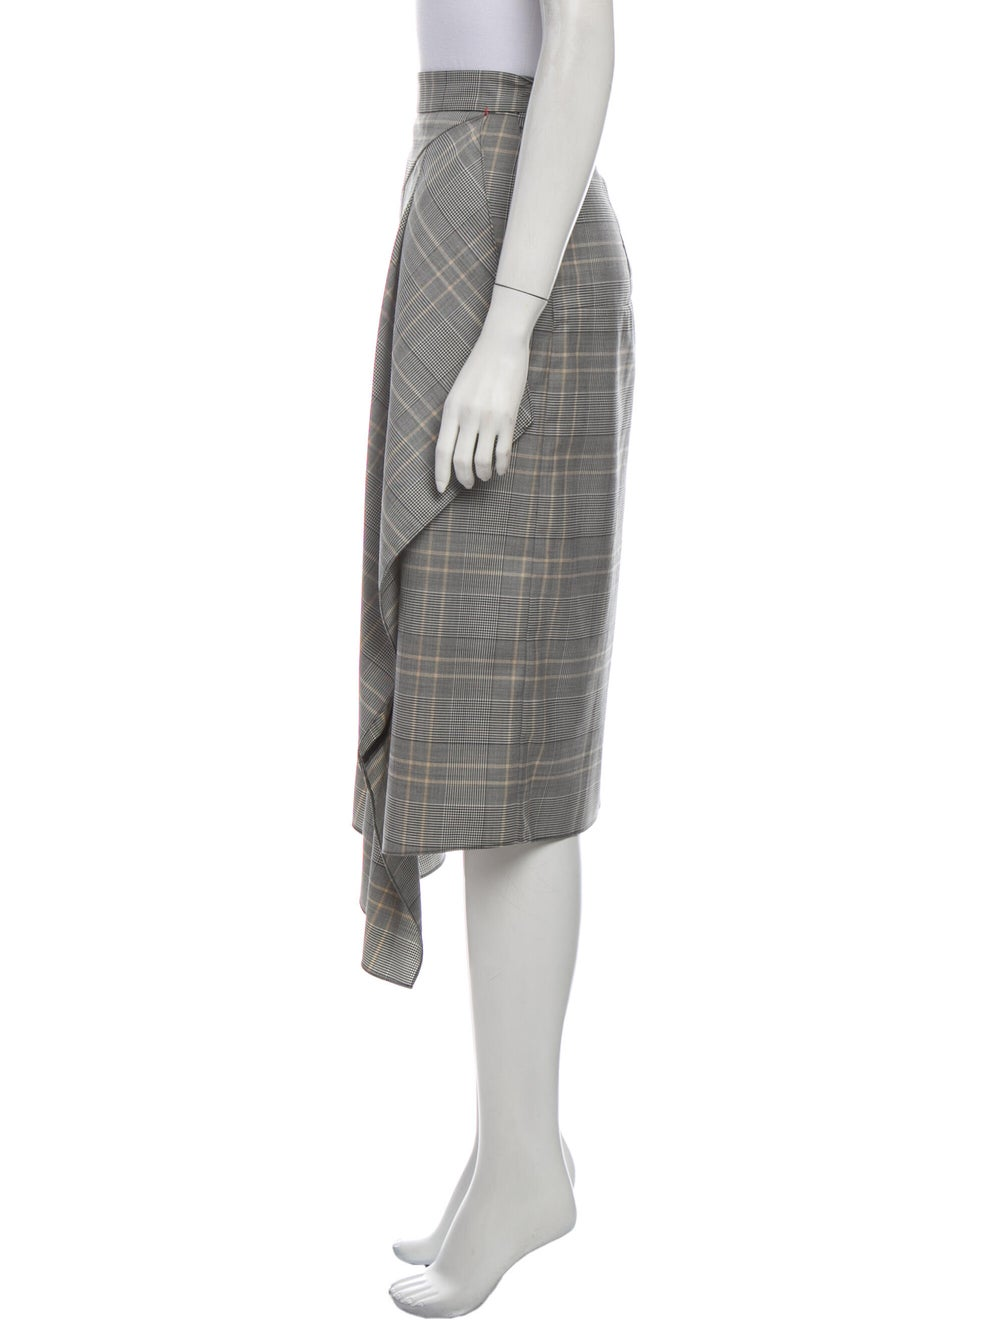 Tibi Plaid Print Midi Length Skirt - image 2